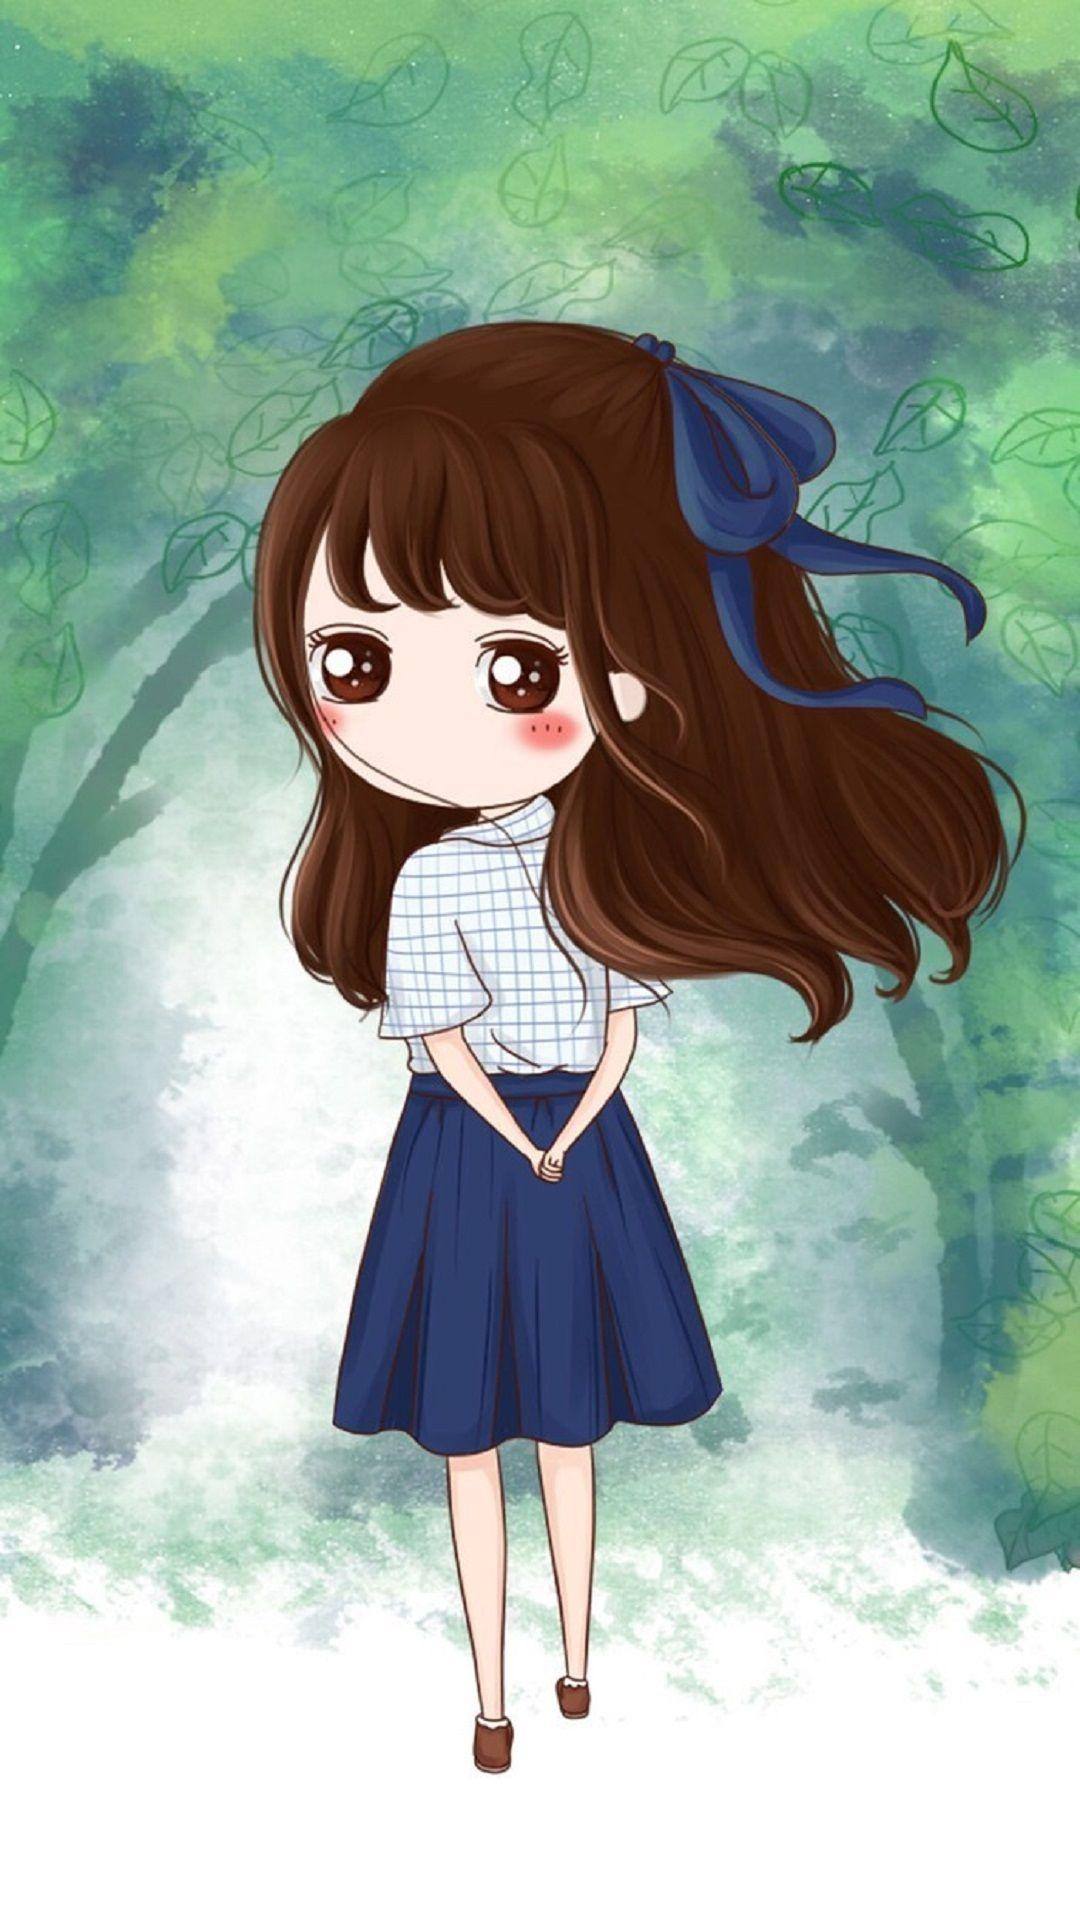 Anime Cute Girl Cartoon Wallpapers Wallpaper Cave